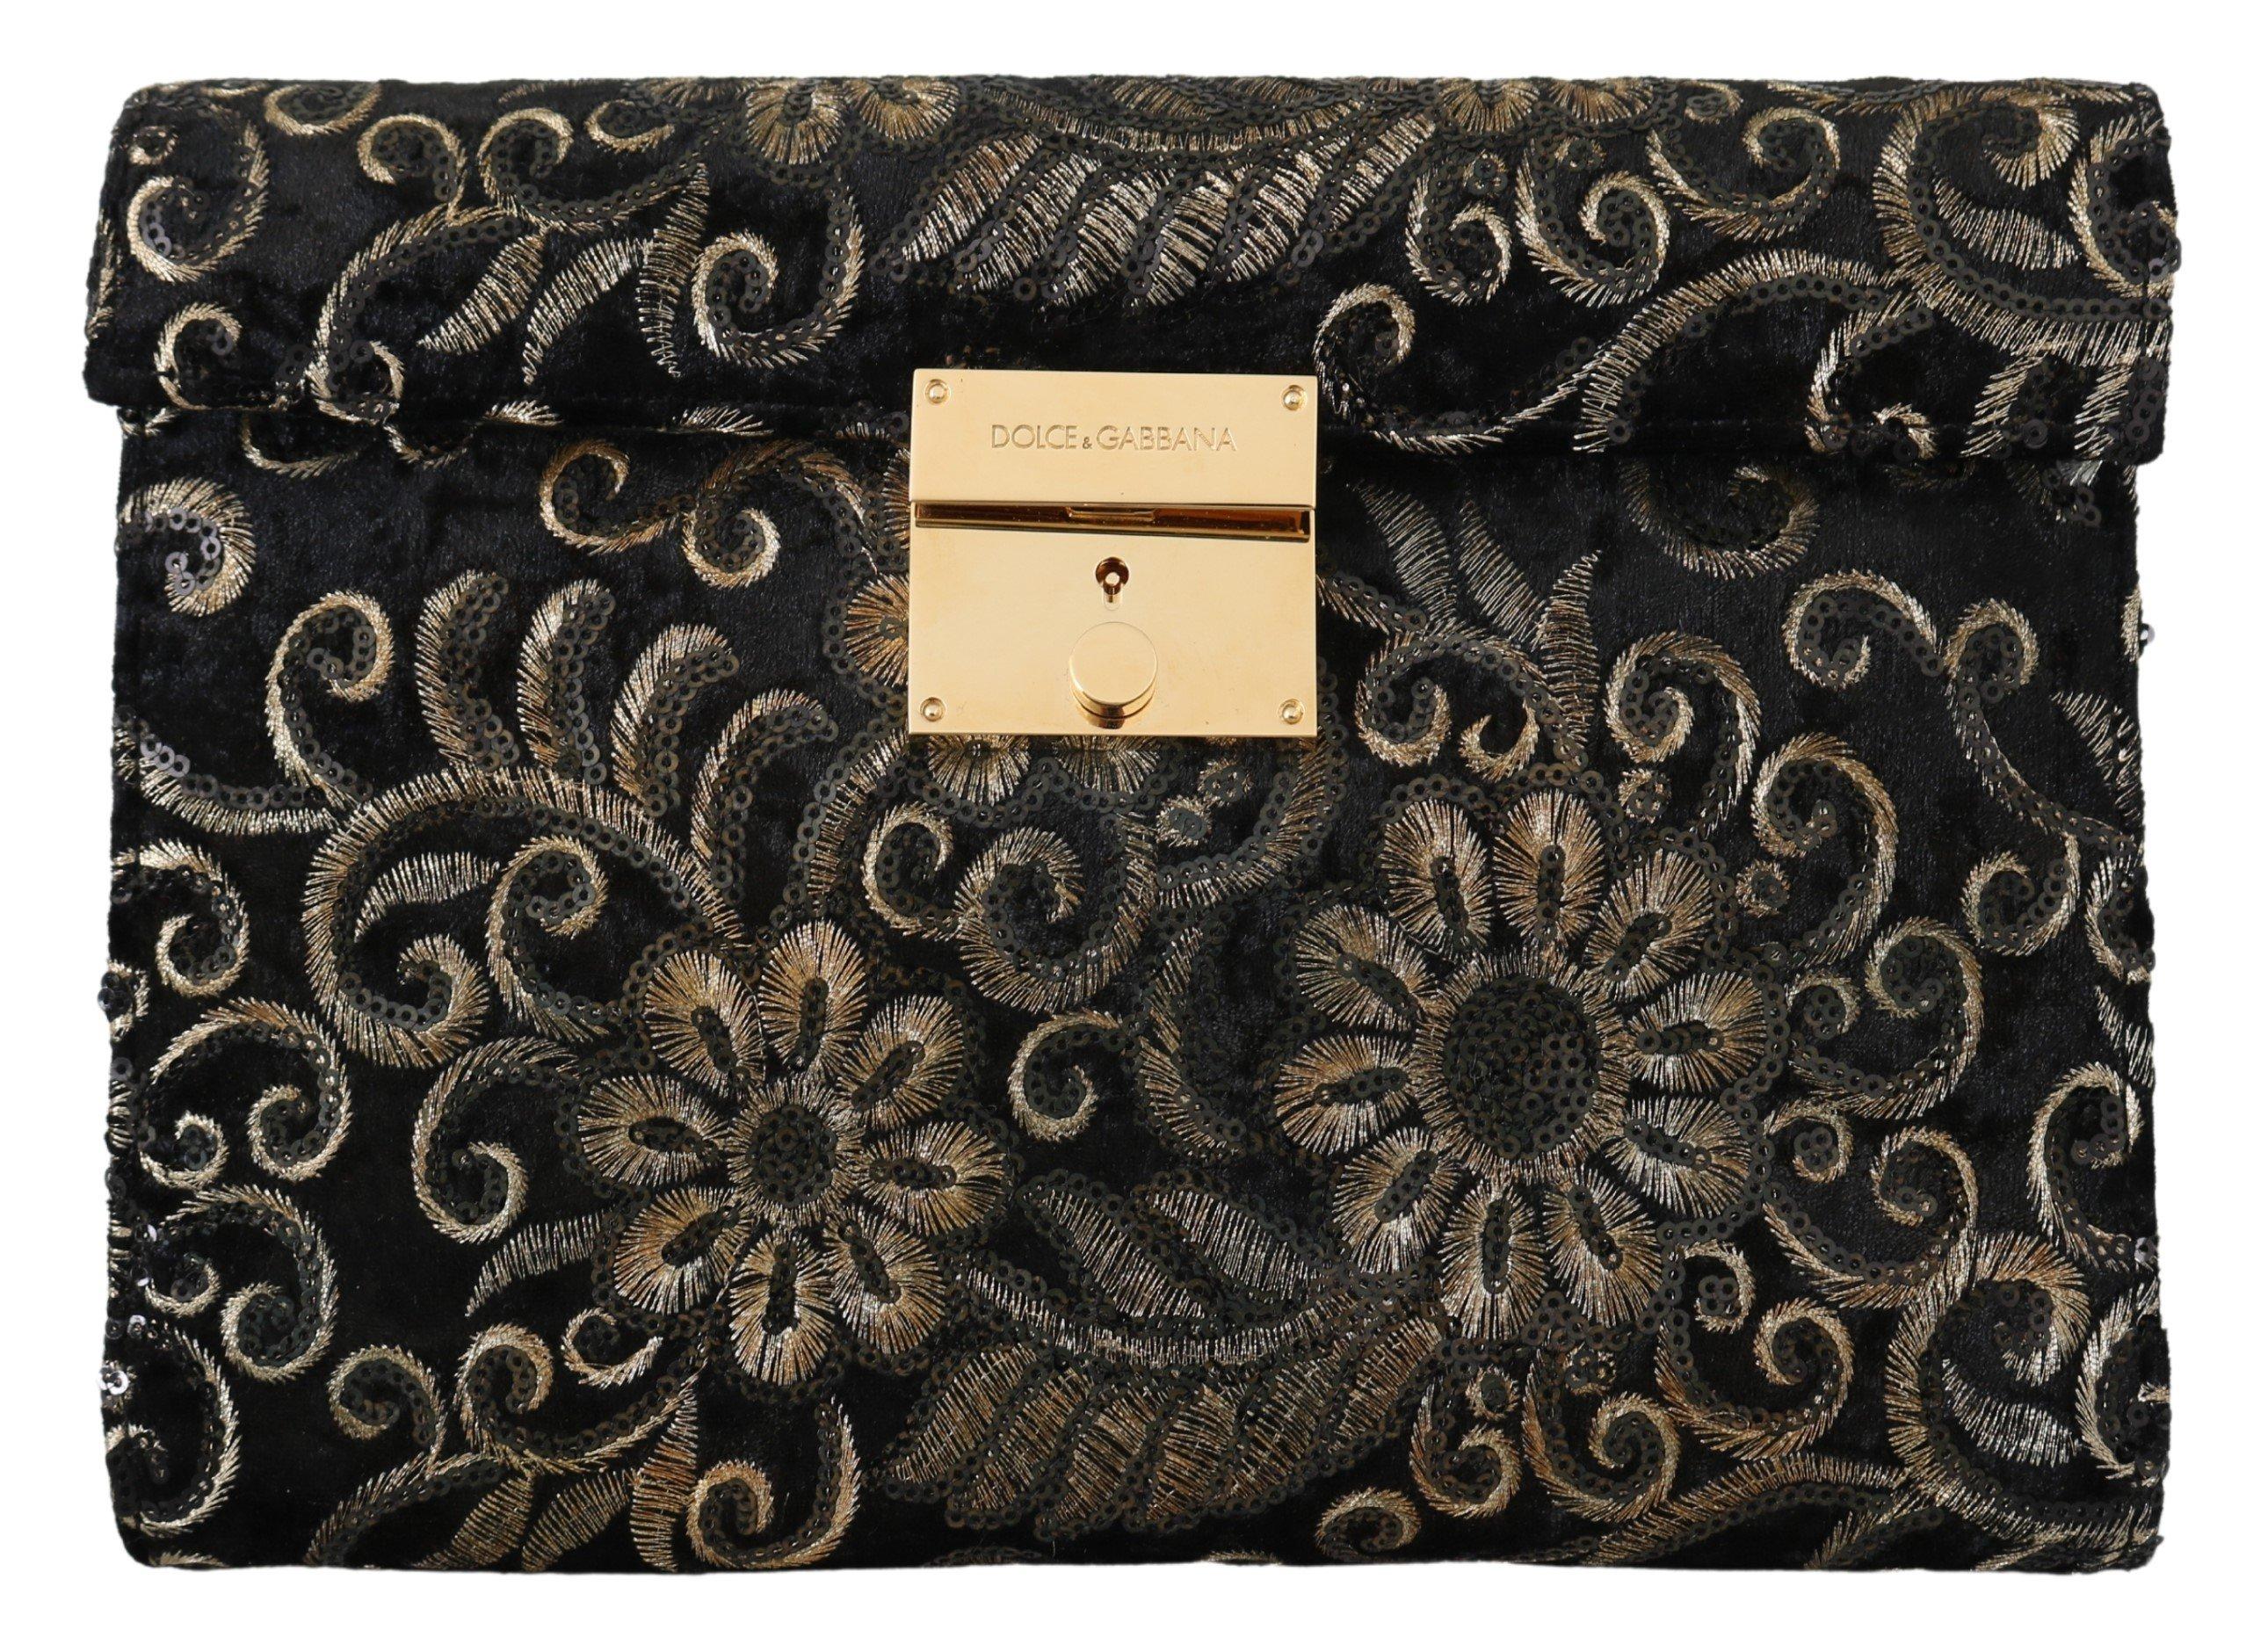 Dolce & Gabbana Men's Ricamo Sequined Leather Briefcase Bag Black VAS9862